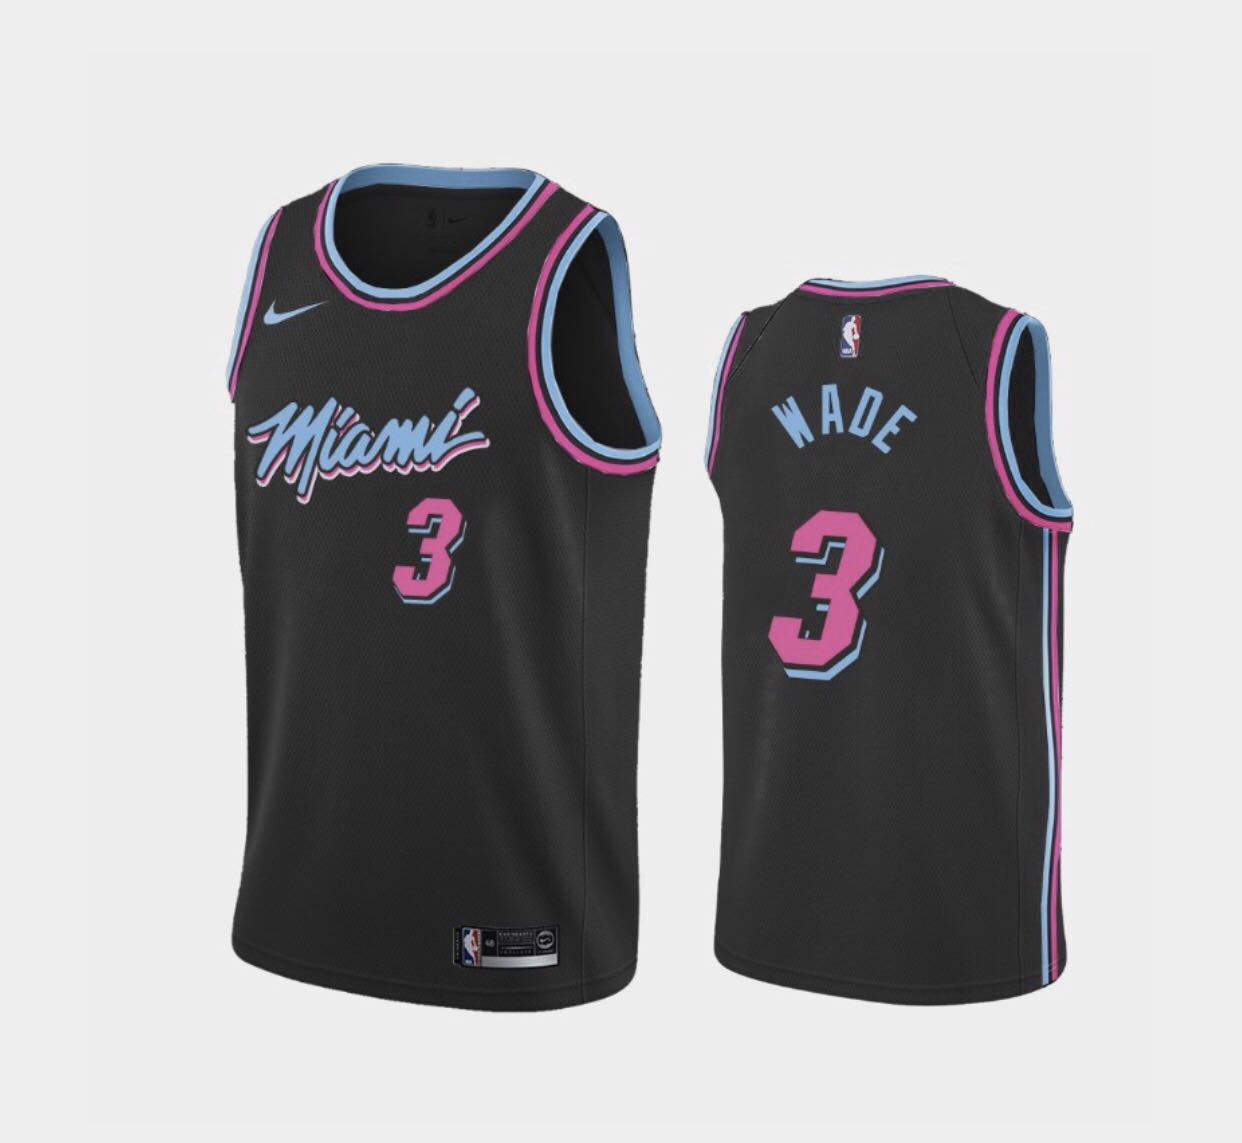 徵收 NBA Miami Heat Dwyane Wade City Edition Jersey, 運動產品 ...